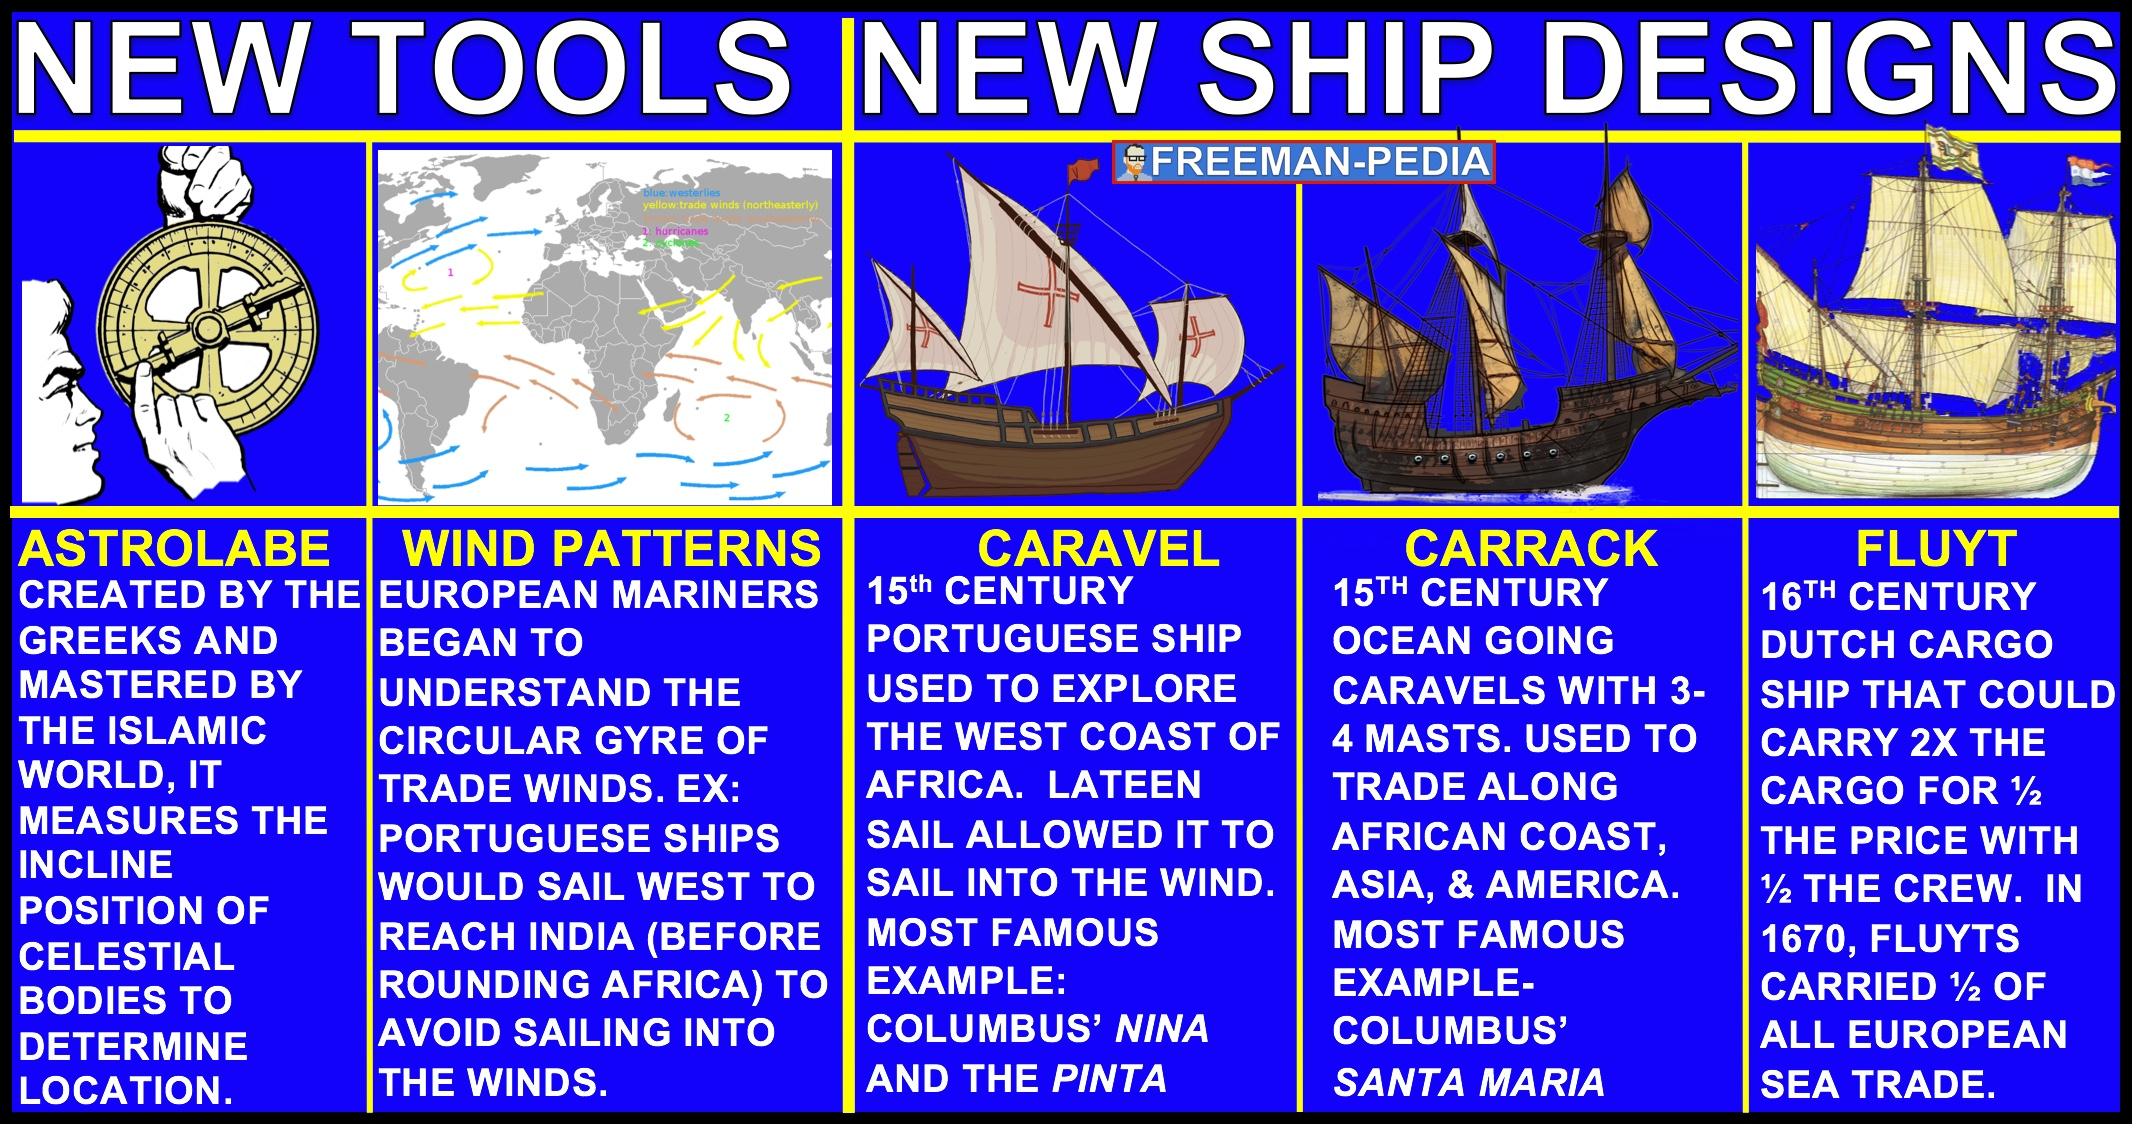 NEW TOOLS NEW SHIP DESIGNS AP WORLD HISTORY FREEMANPEDIA.jpeg